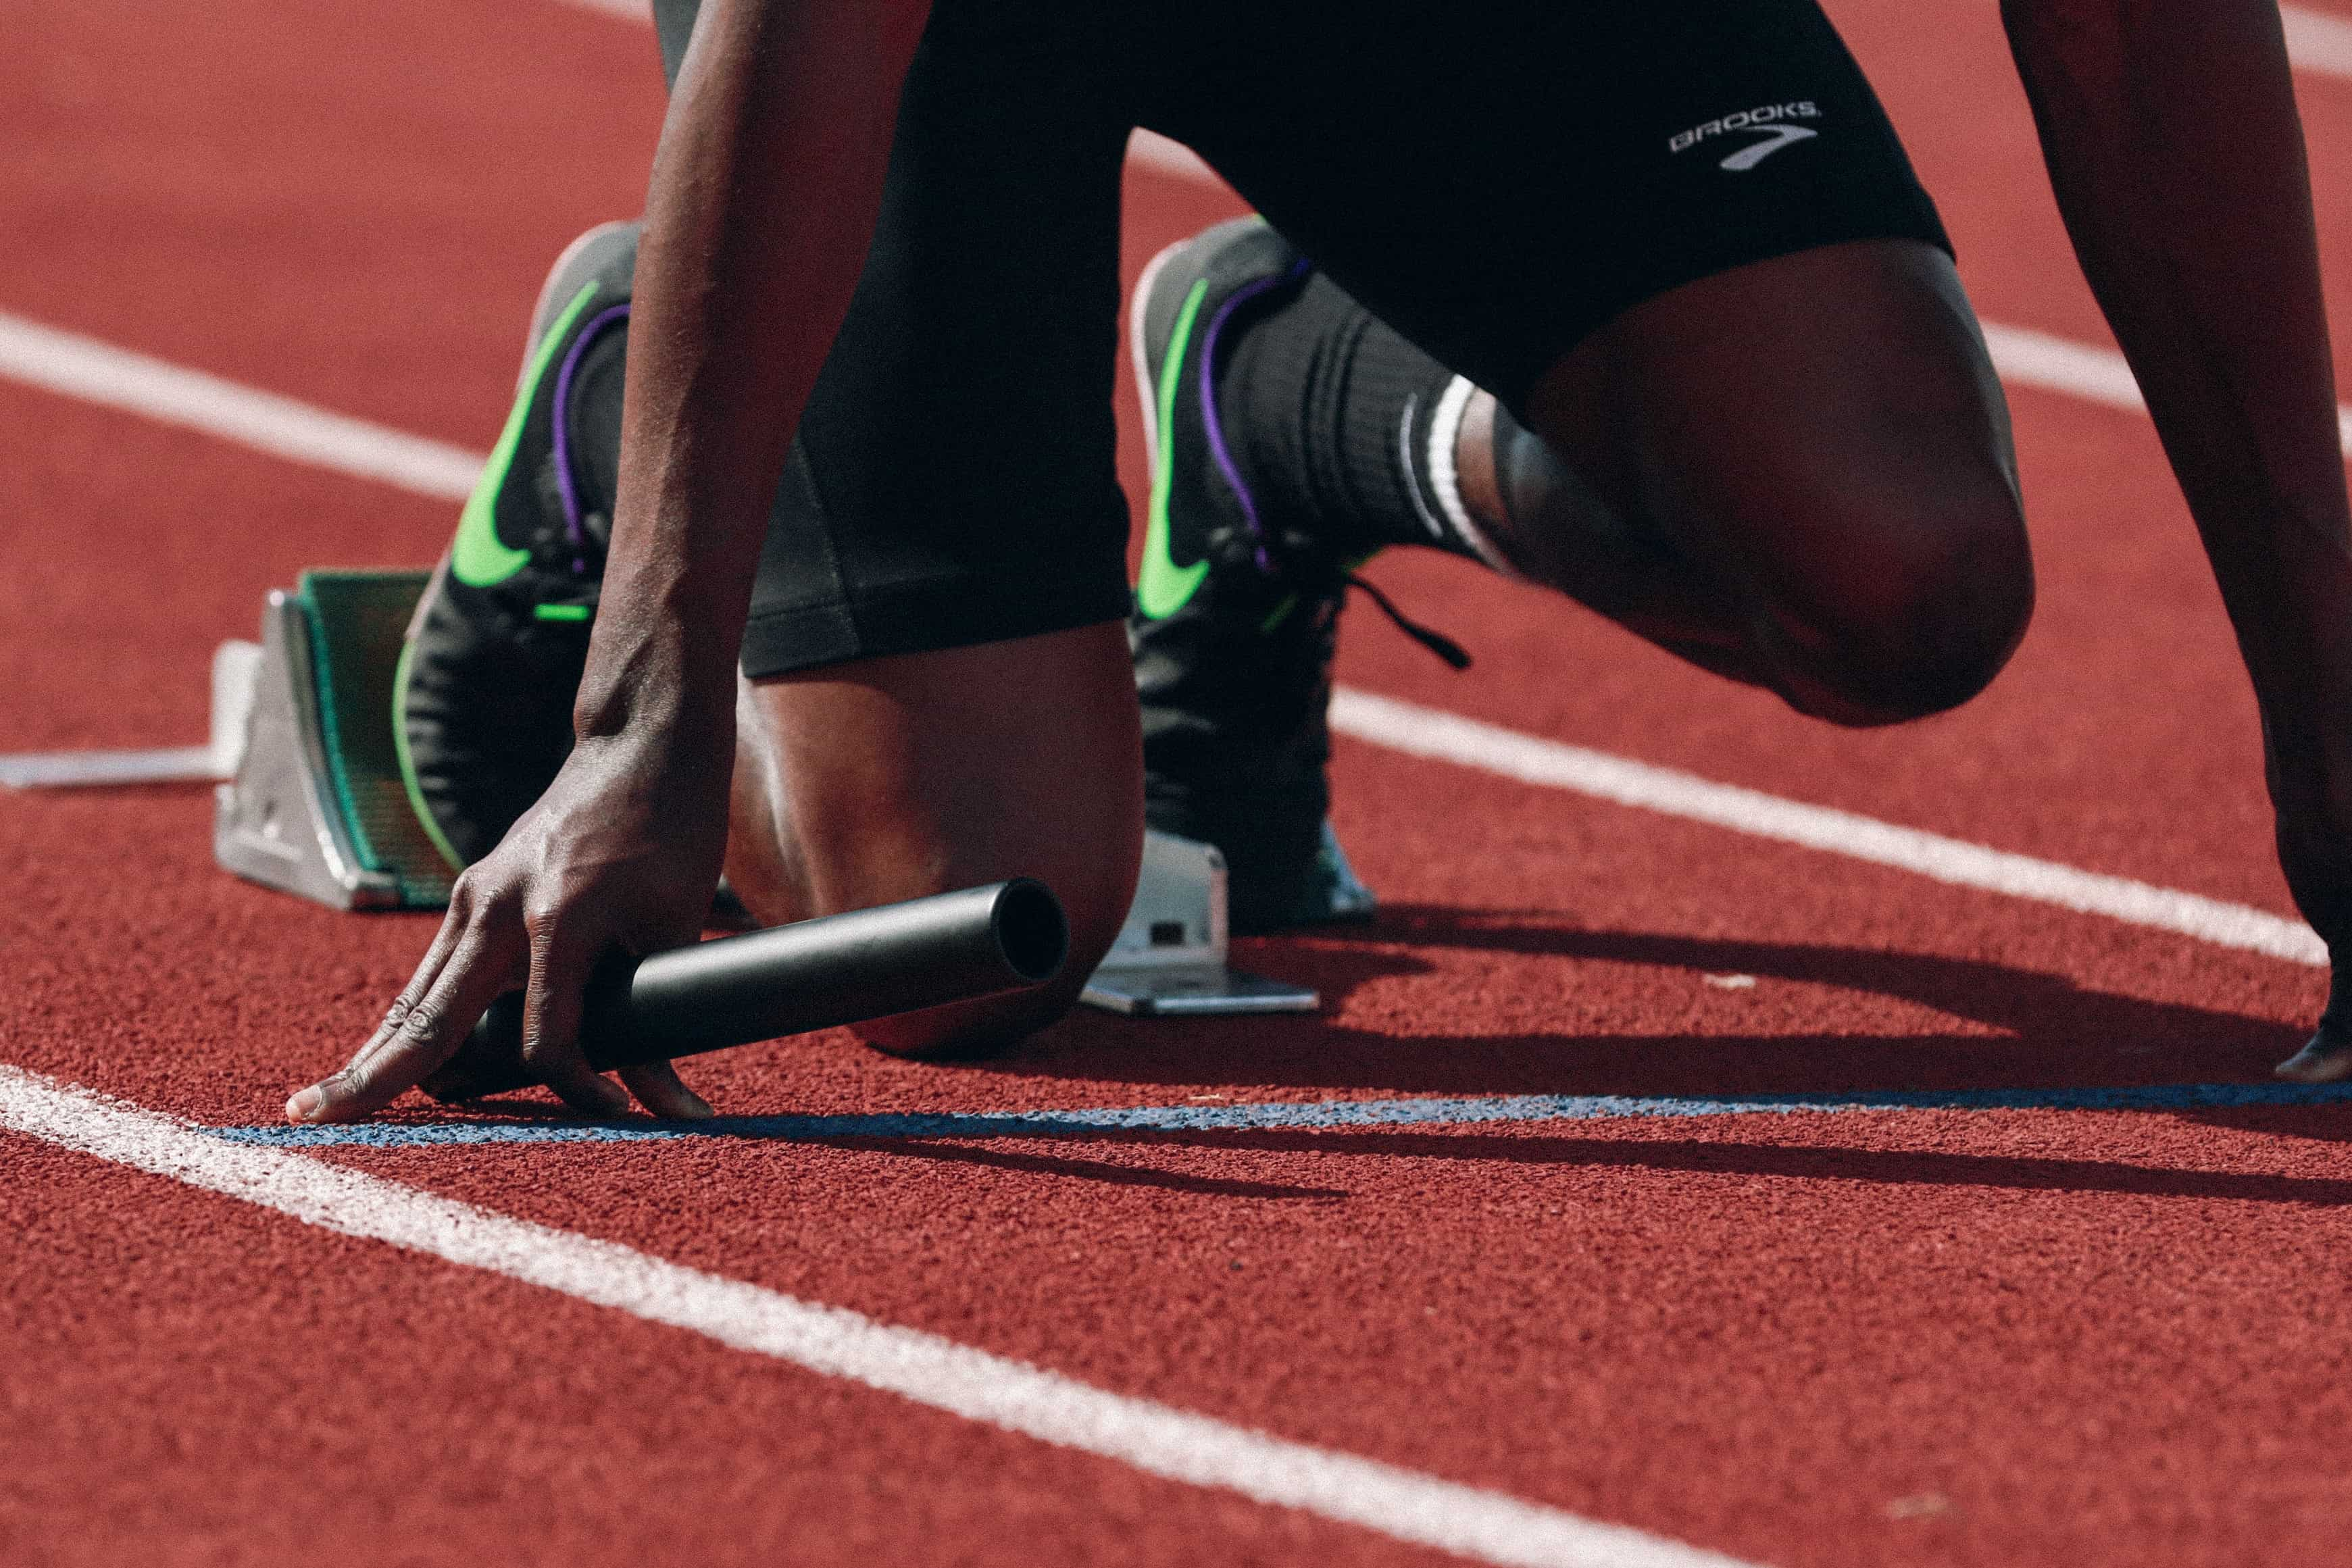 Black athlete in starting blocks